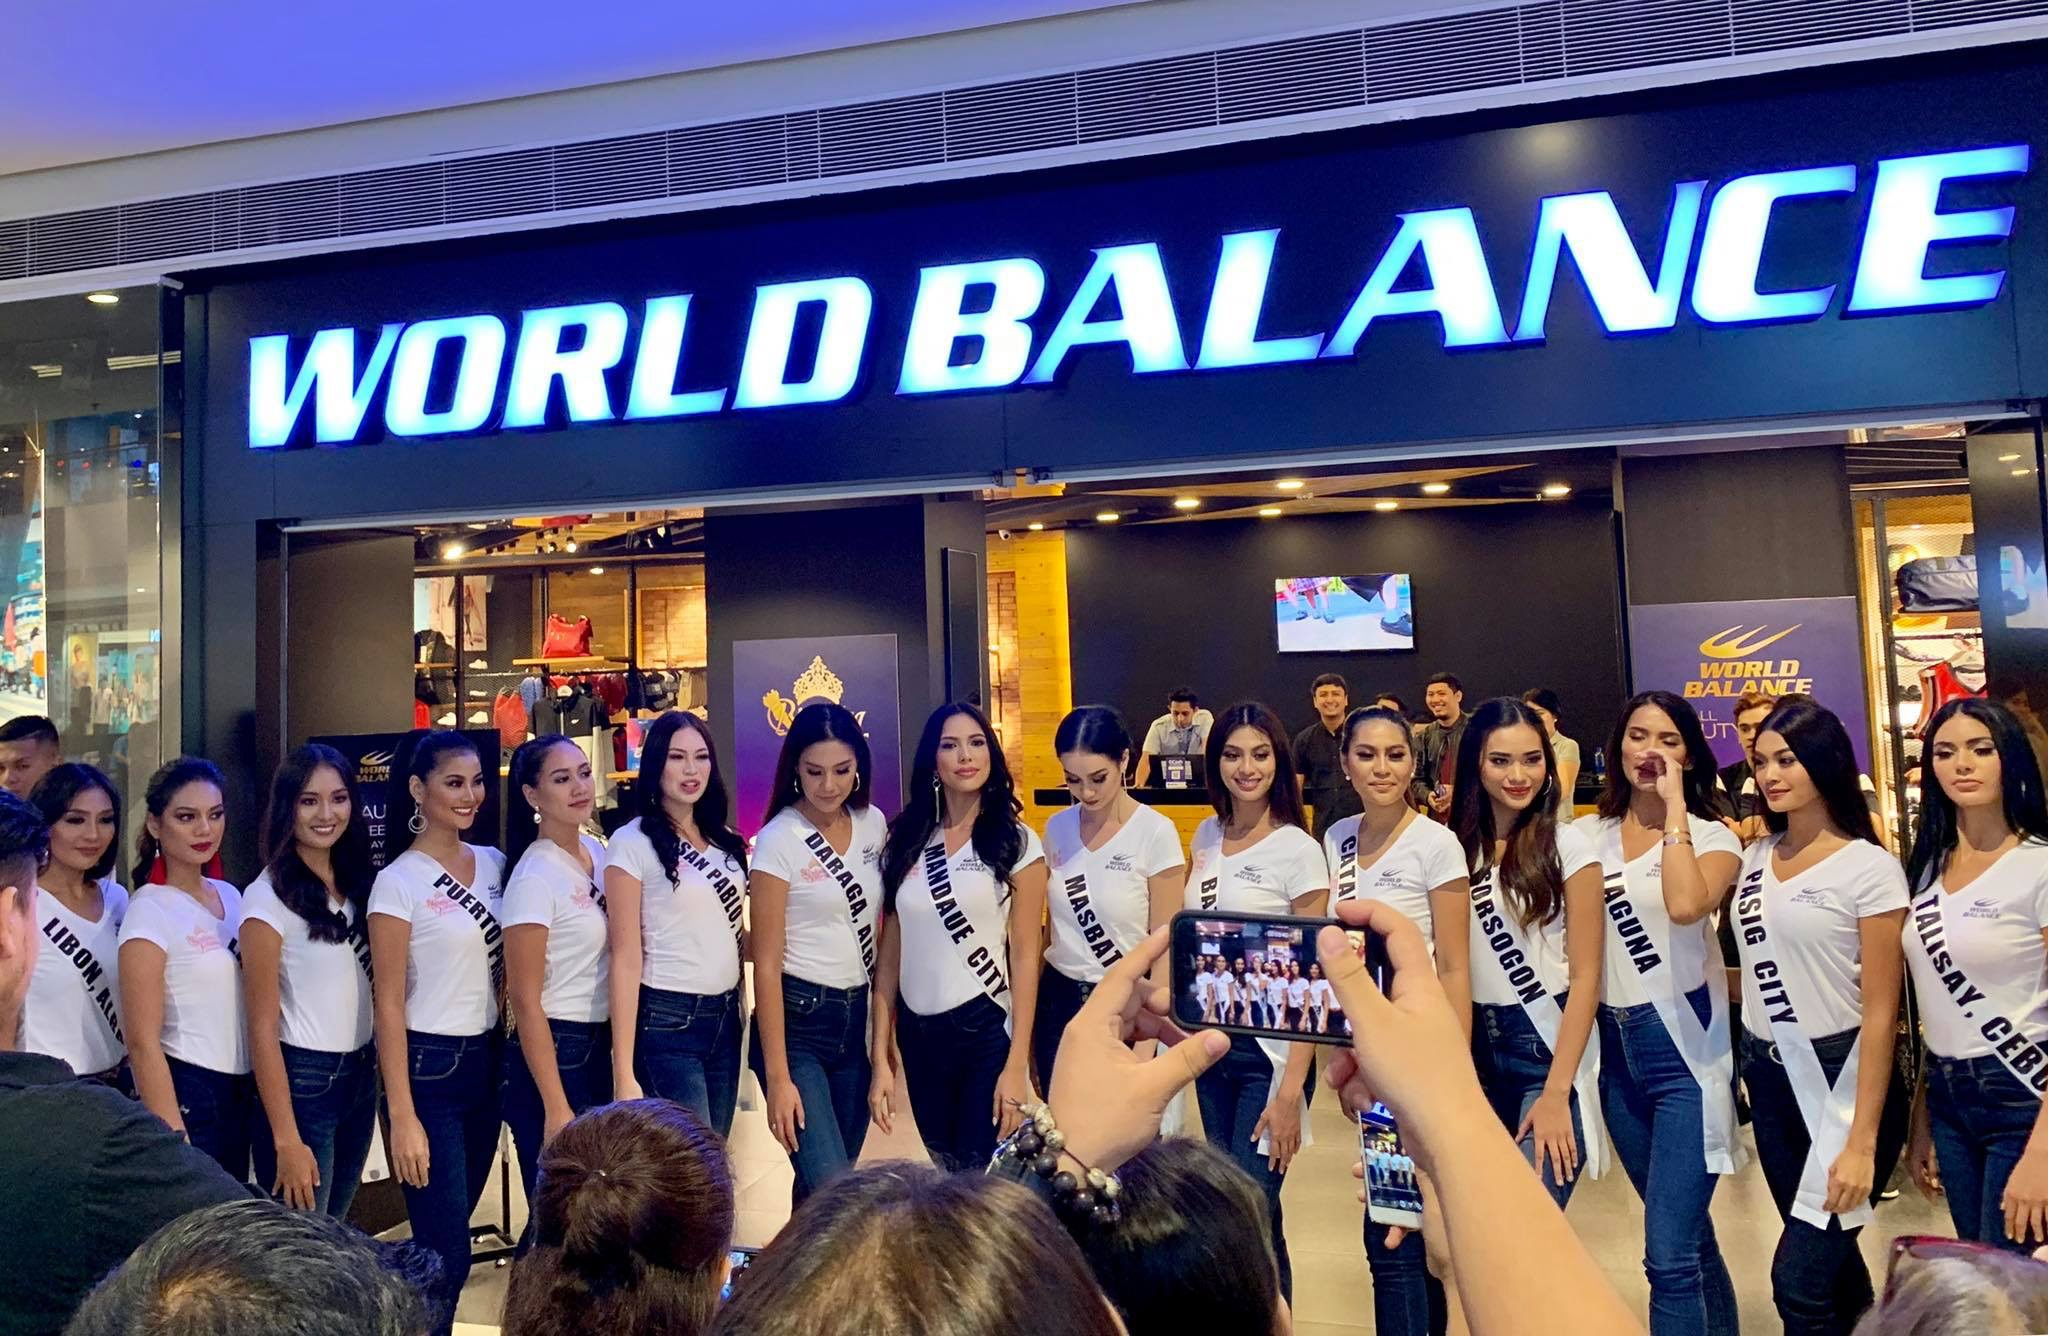 Binibining Pilipinas Finalists for World Balance #BeautyAndSole